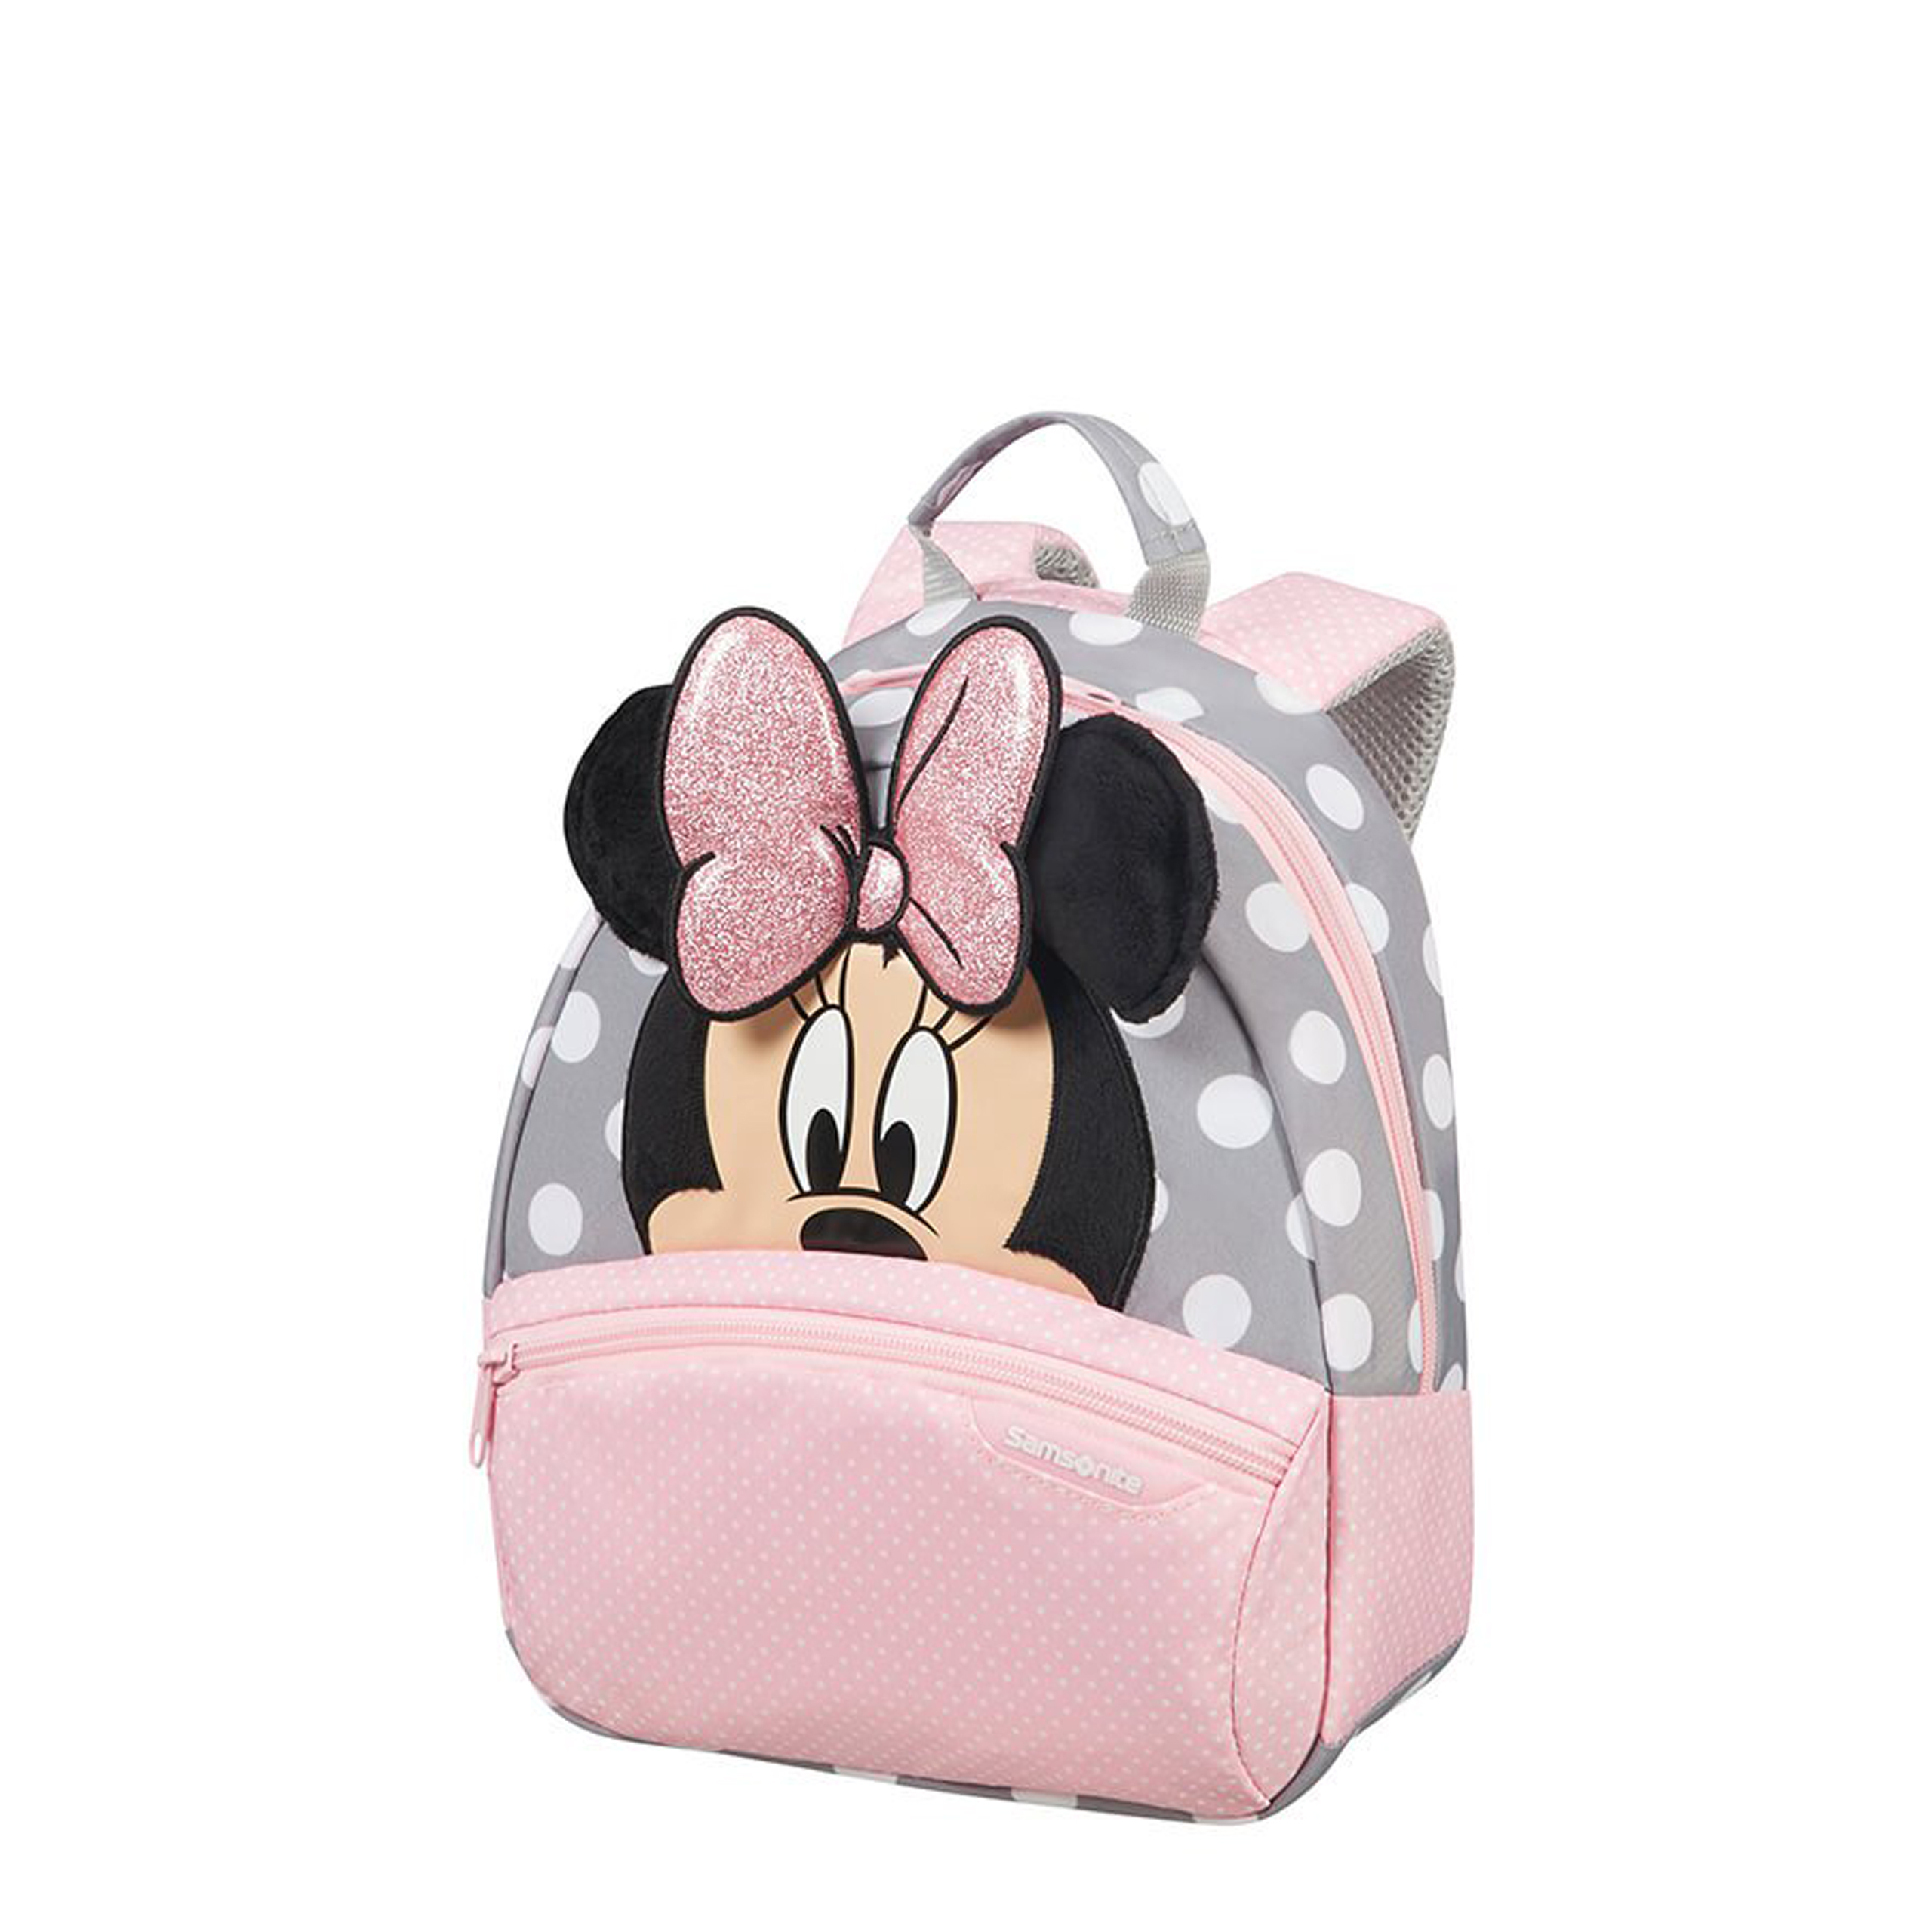 efc427338af1c New Line - Plecak Samsonite Disney Minnie Glitter 40C 90 001 - Twoja ...